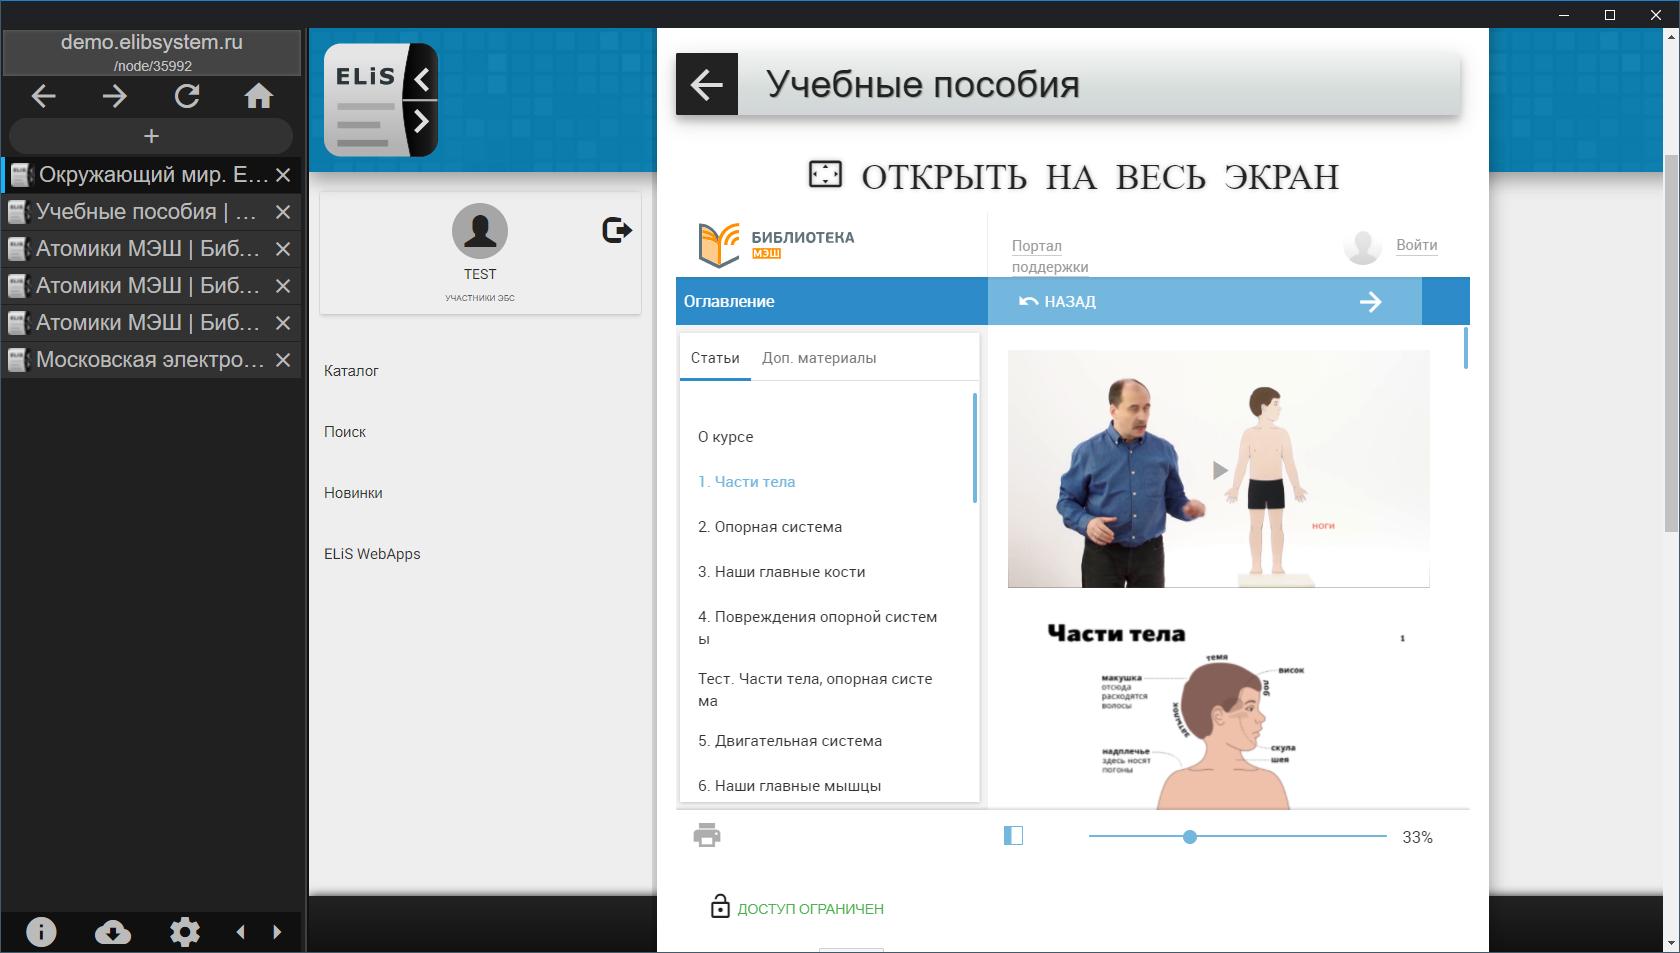 uchebnik-mos.ru.png